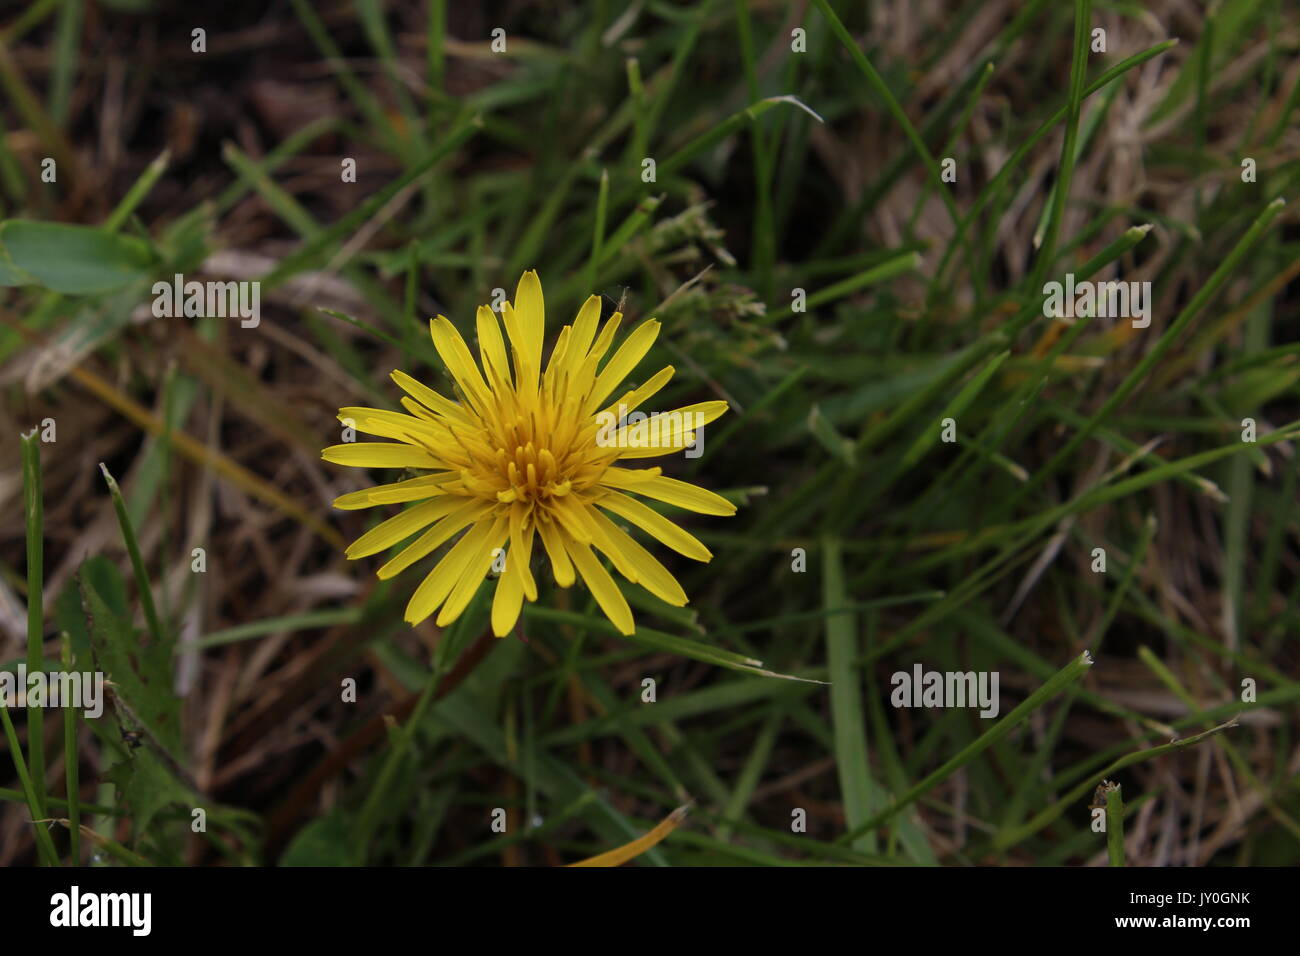 Photo of a growing dandelion. - Stock Image